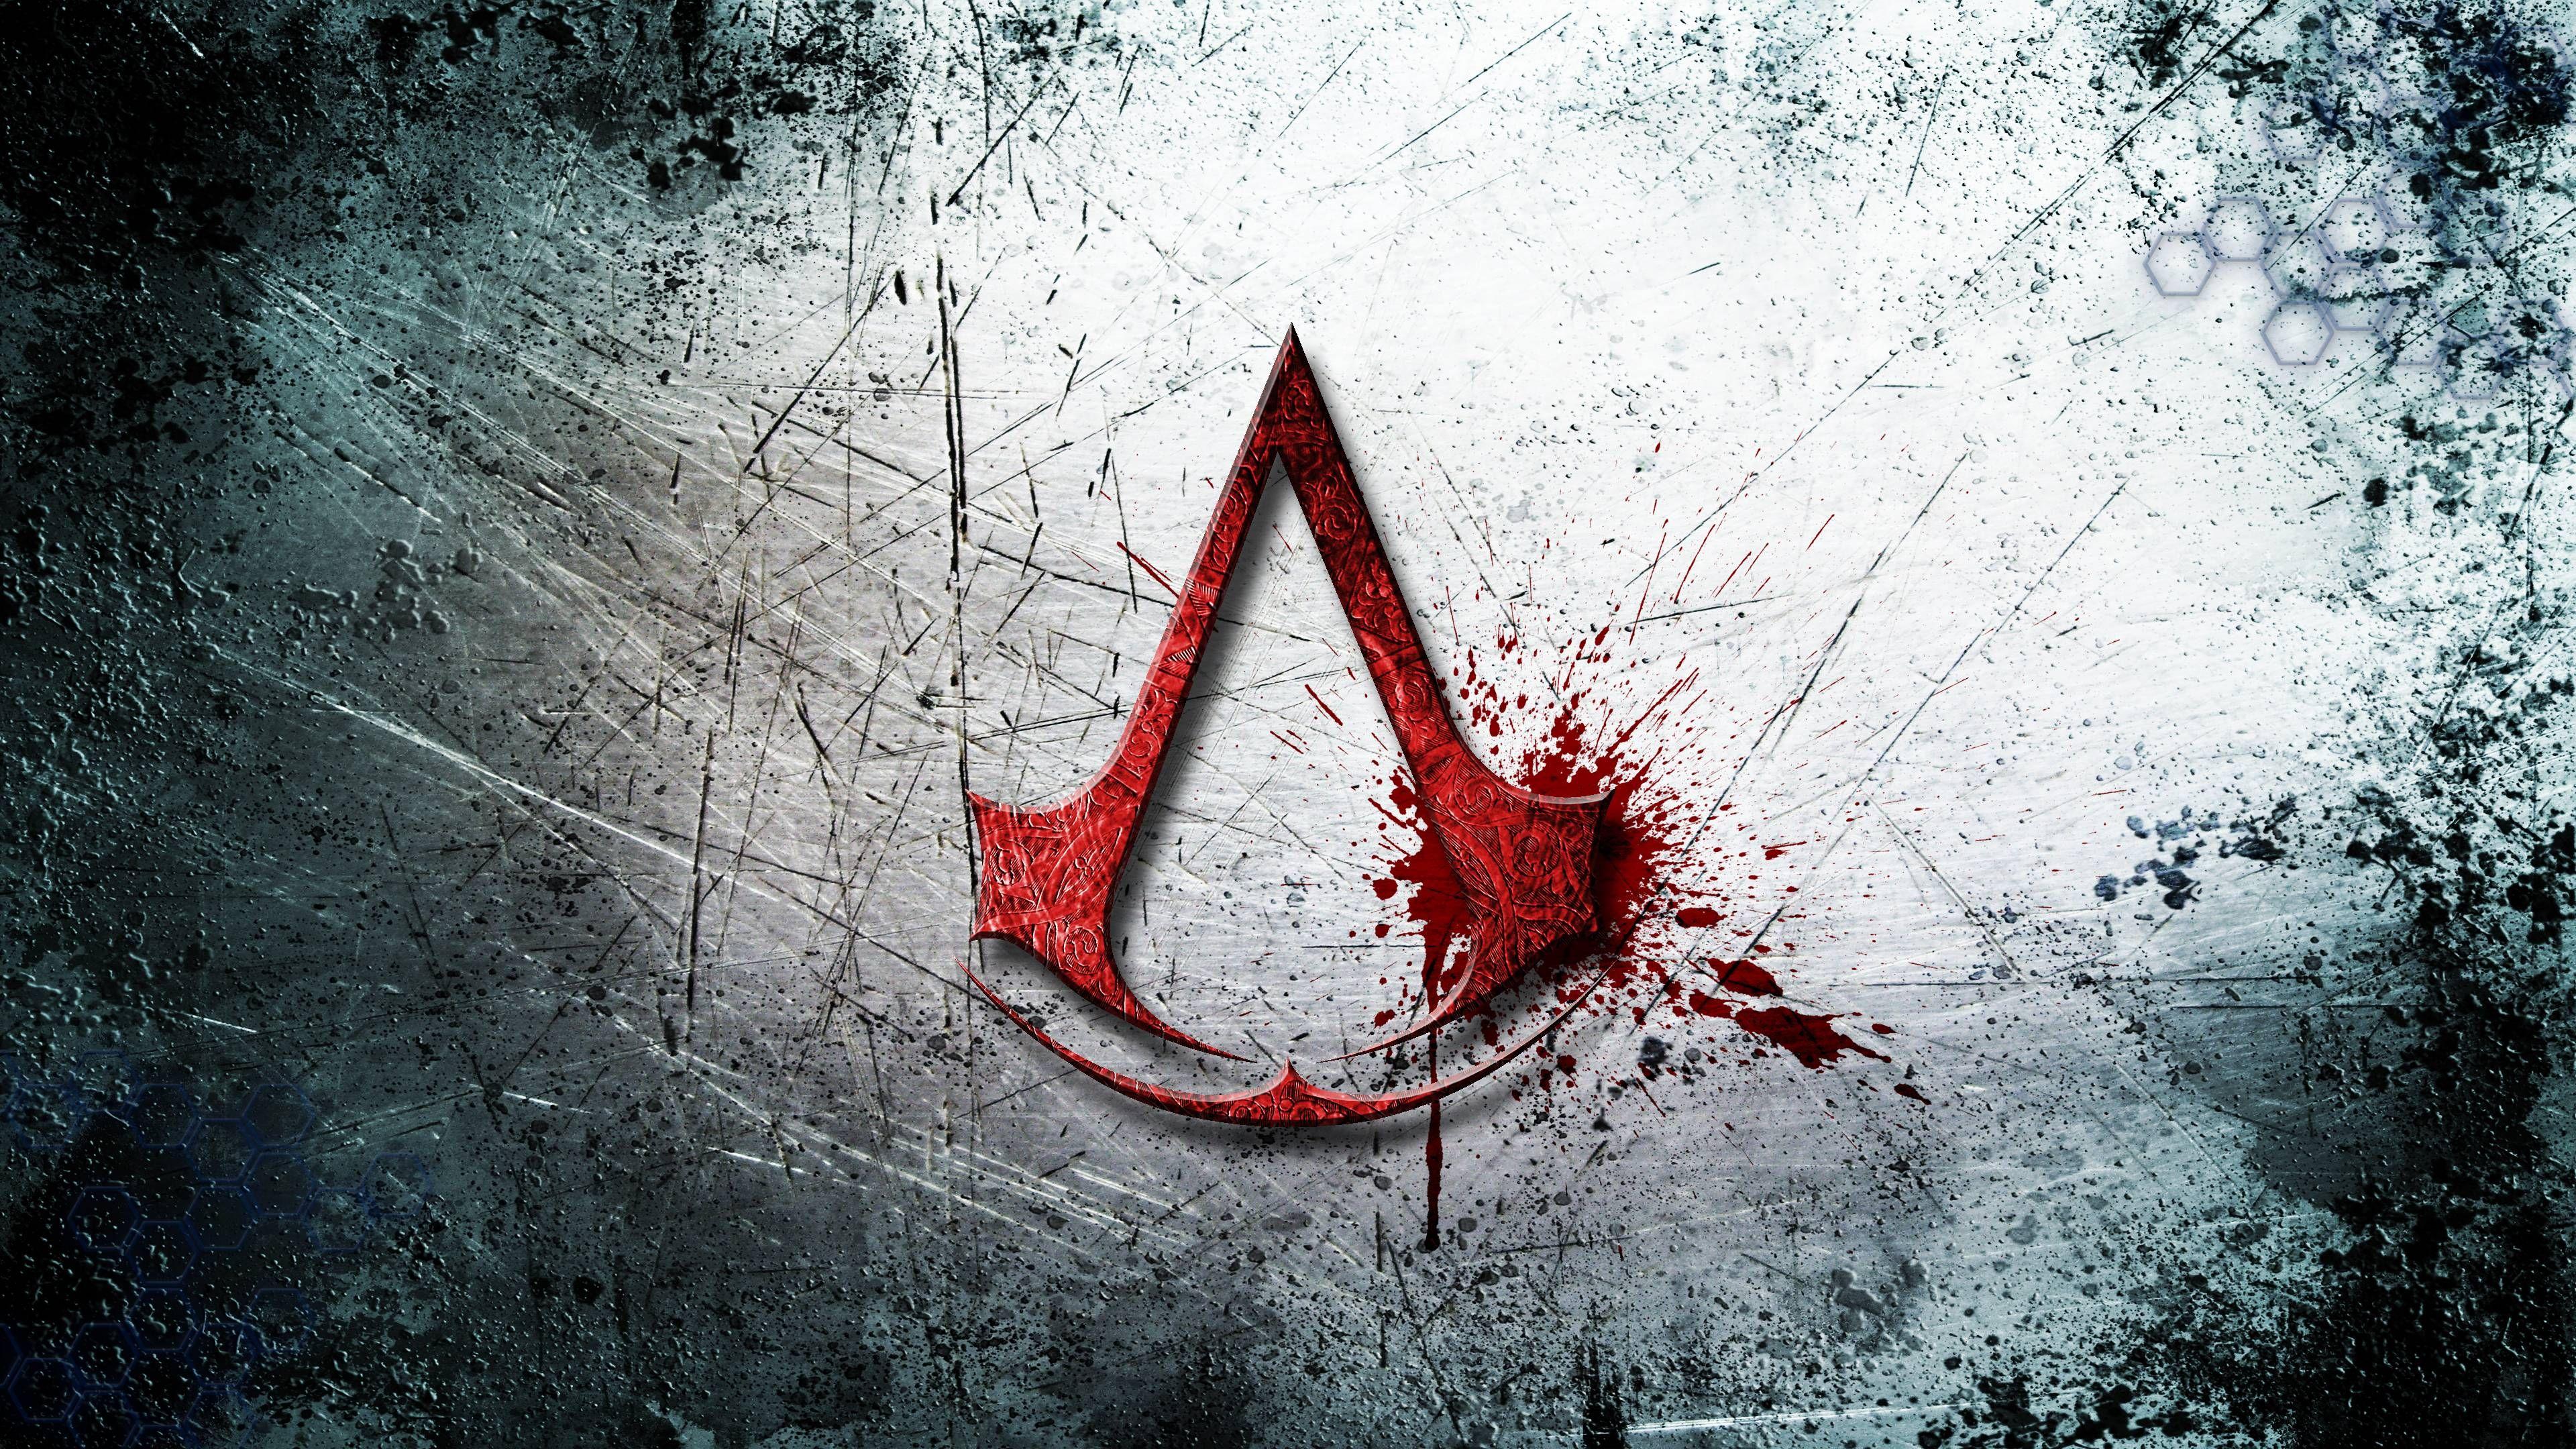 Assassins Creed Wallpaper | 3840x2160 | ID:39572 | Assassin's creed | Assassins Creed, Assassin ...